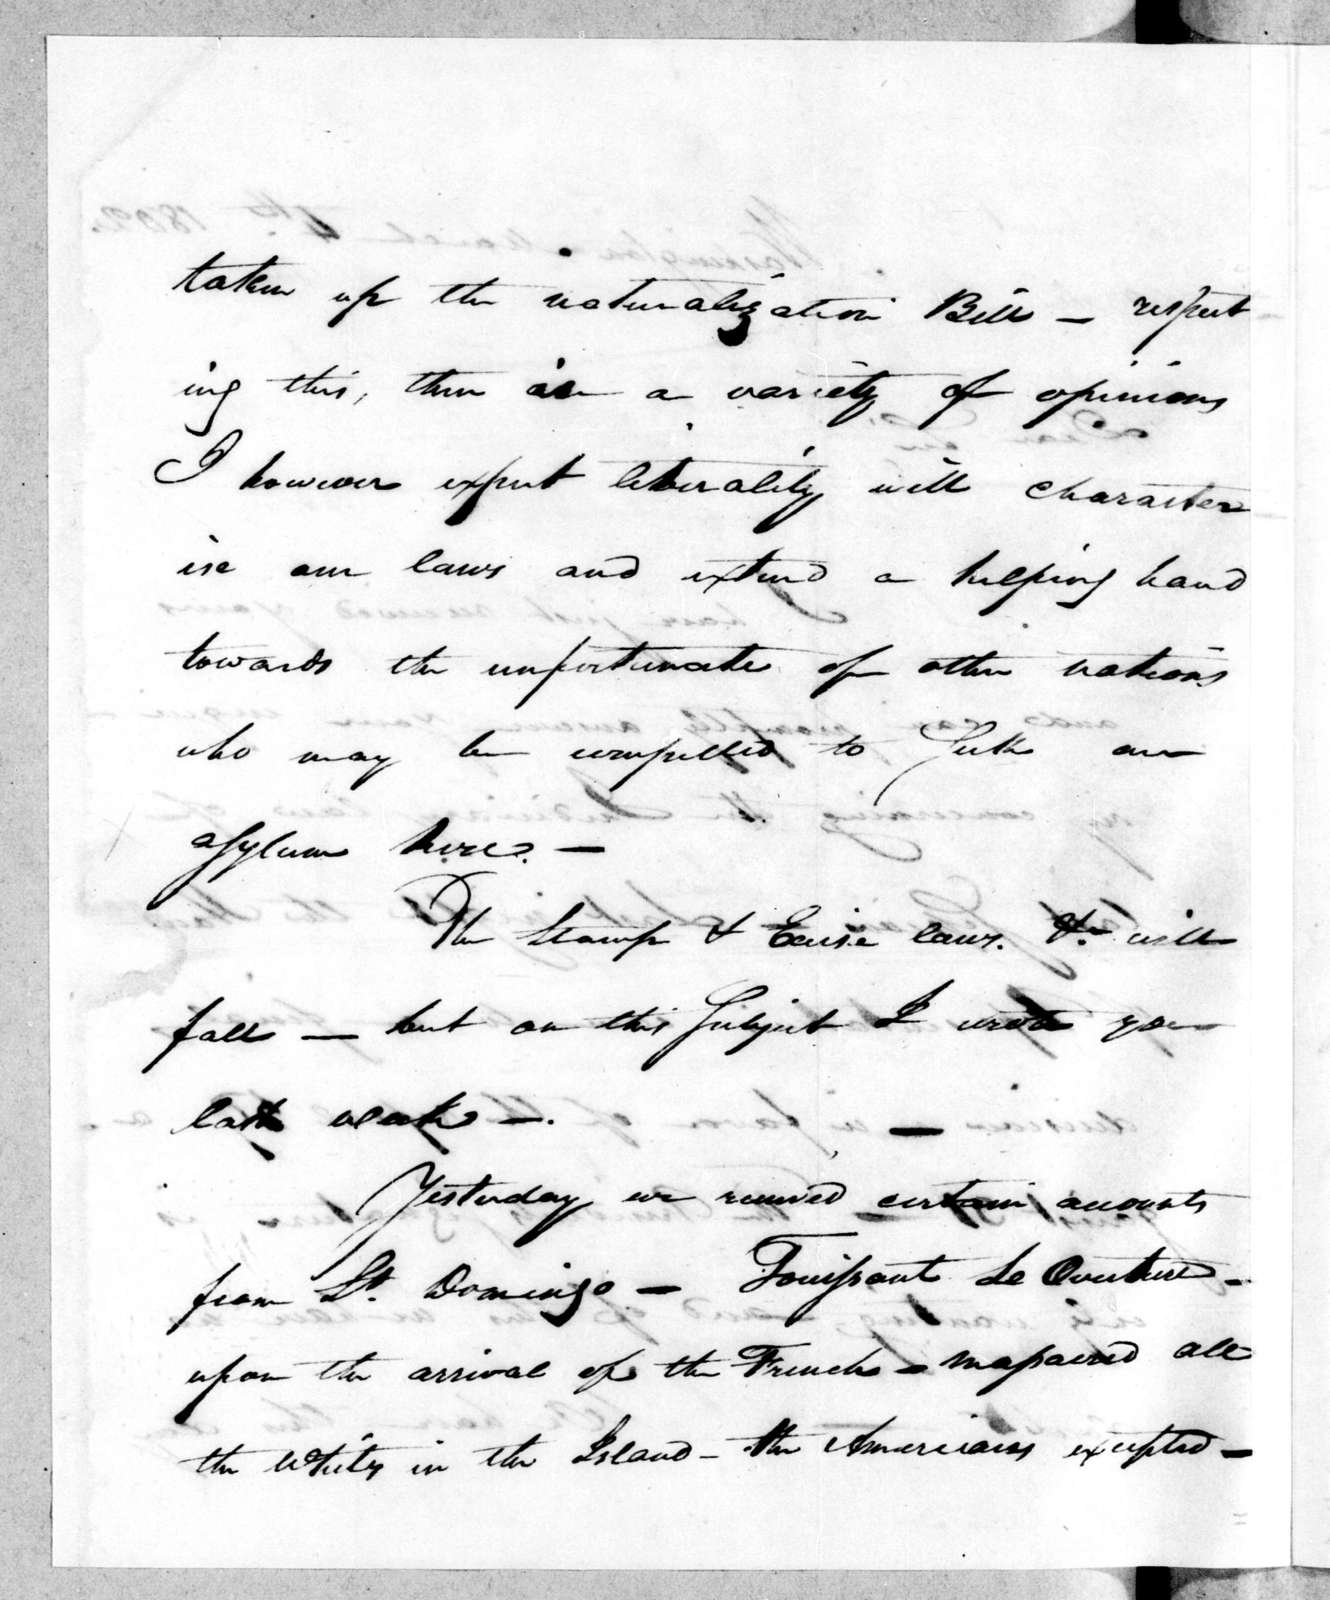 William Dickson to Andrew Jackson, March 4, 1802